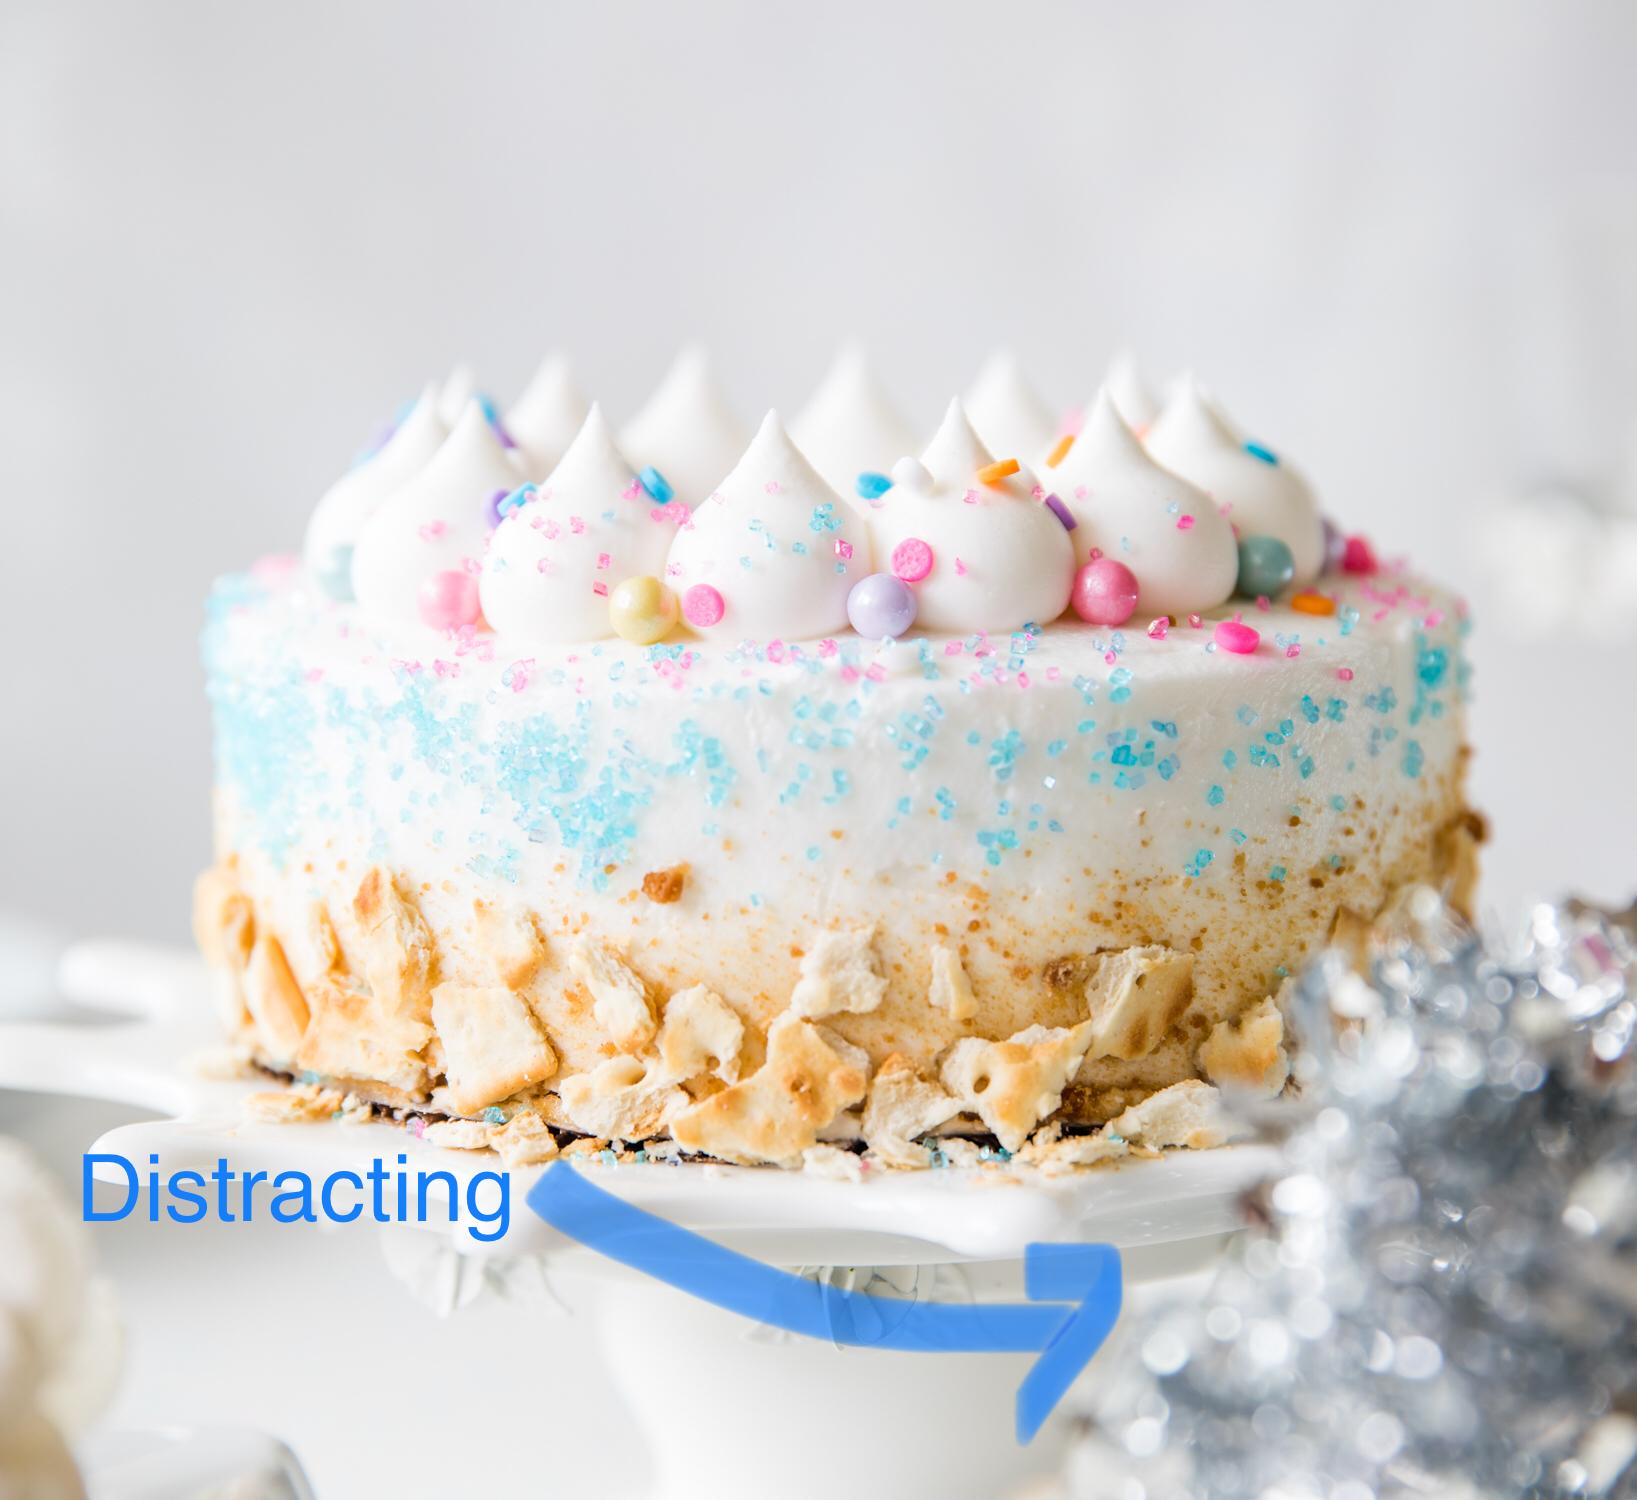 maha-munaf-food-photography-askmahamonday-vanilla-cake (3).jpg